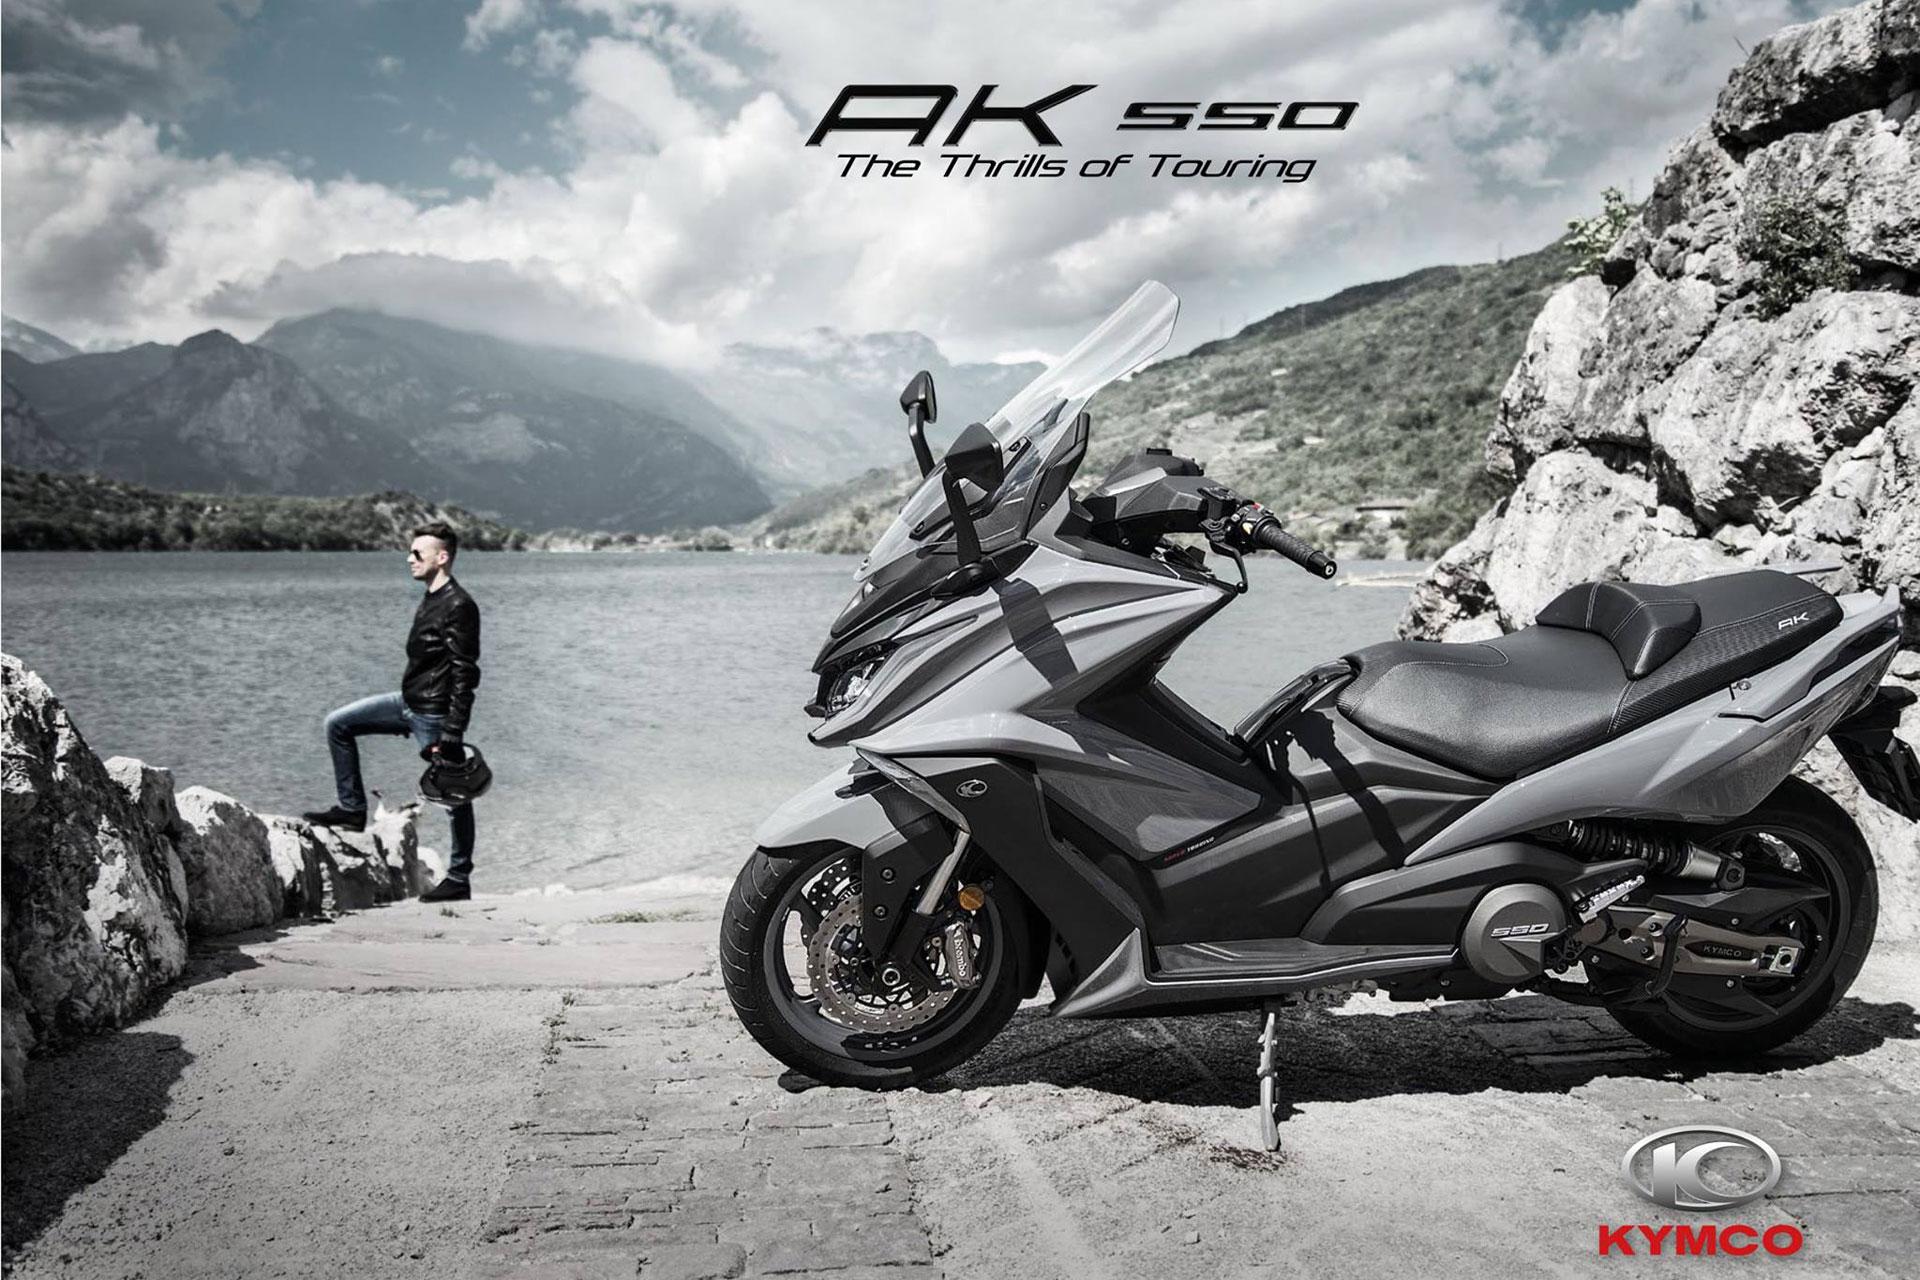 2018 Kymco AK550 Scooter